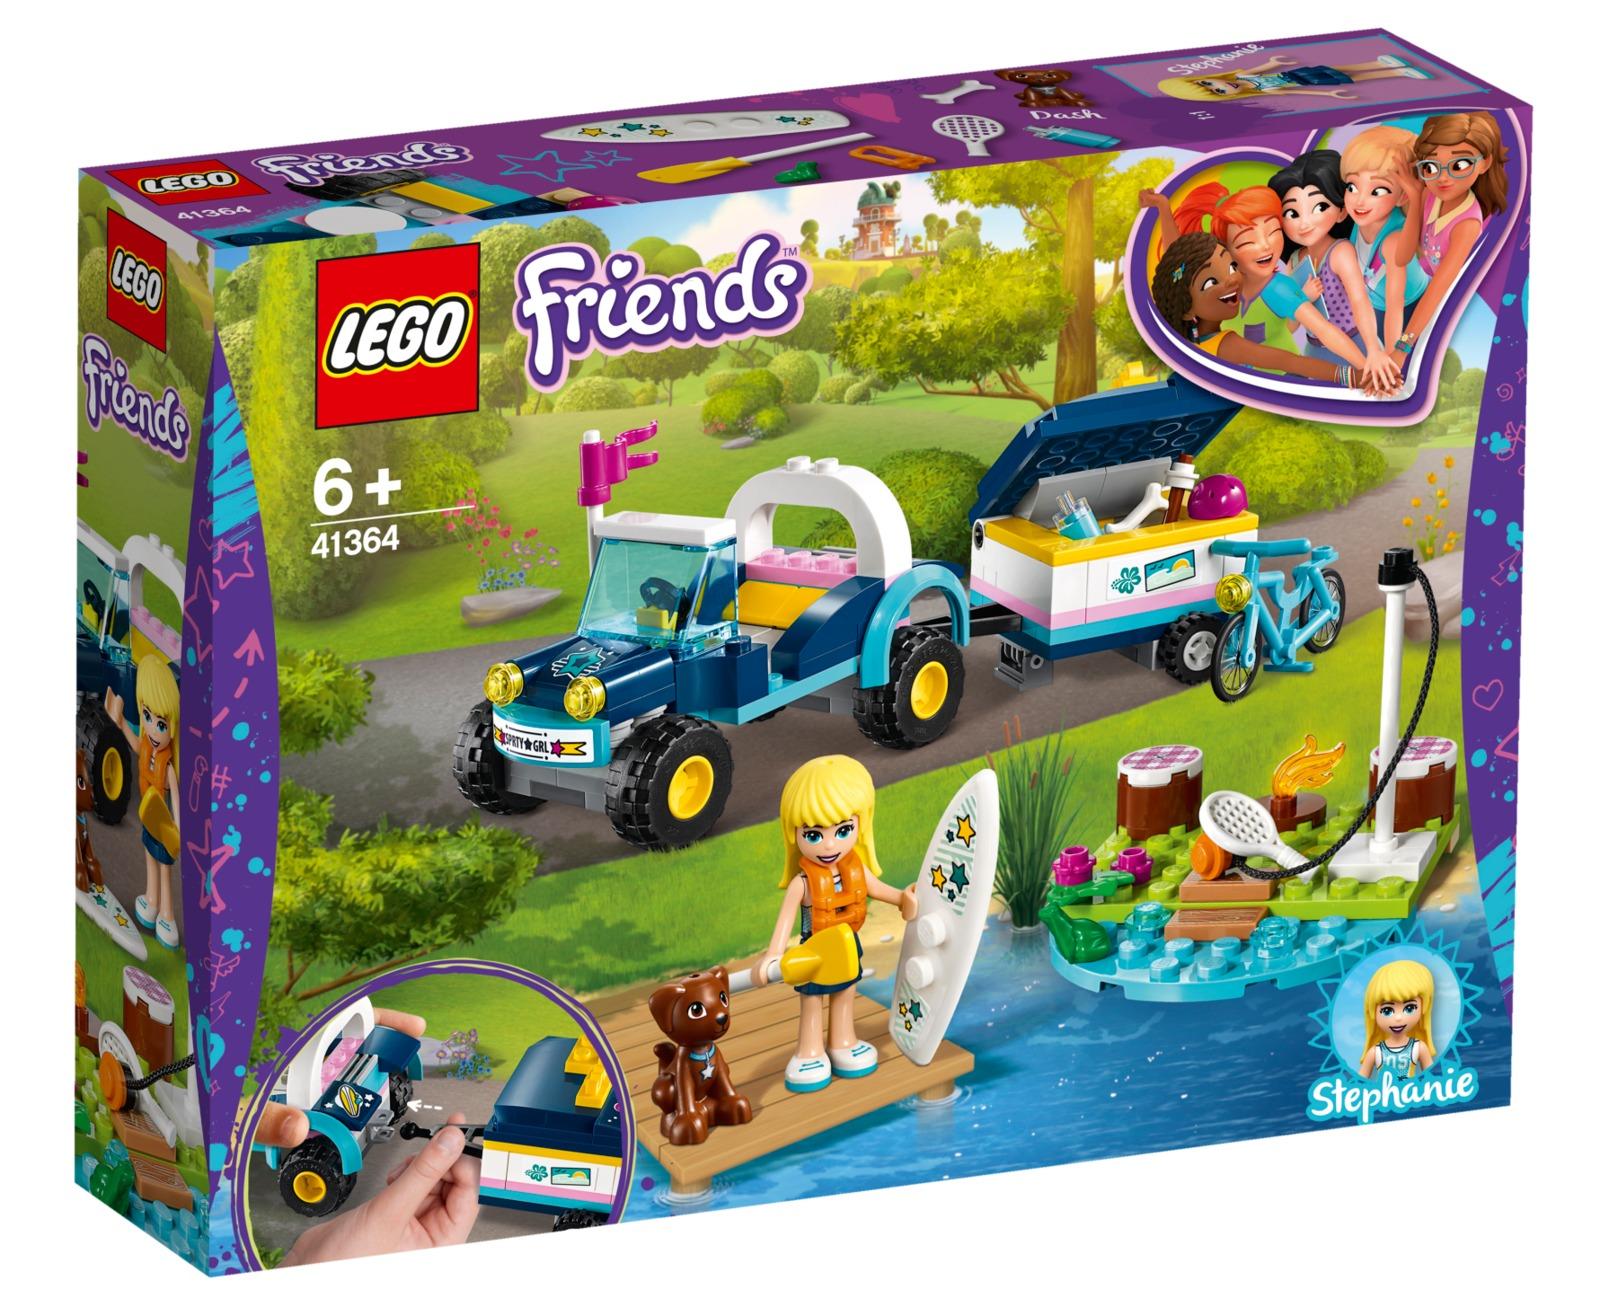 LEGO Friends: Stephanie's Buggy & Trailer (41364) image